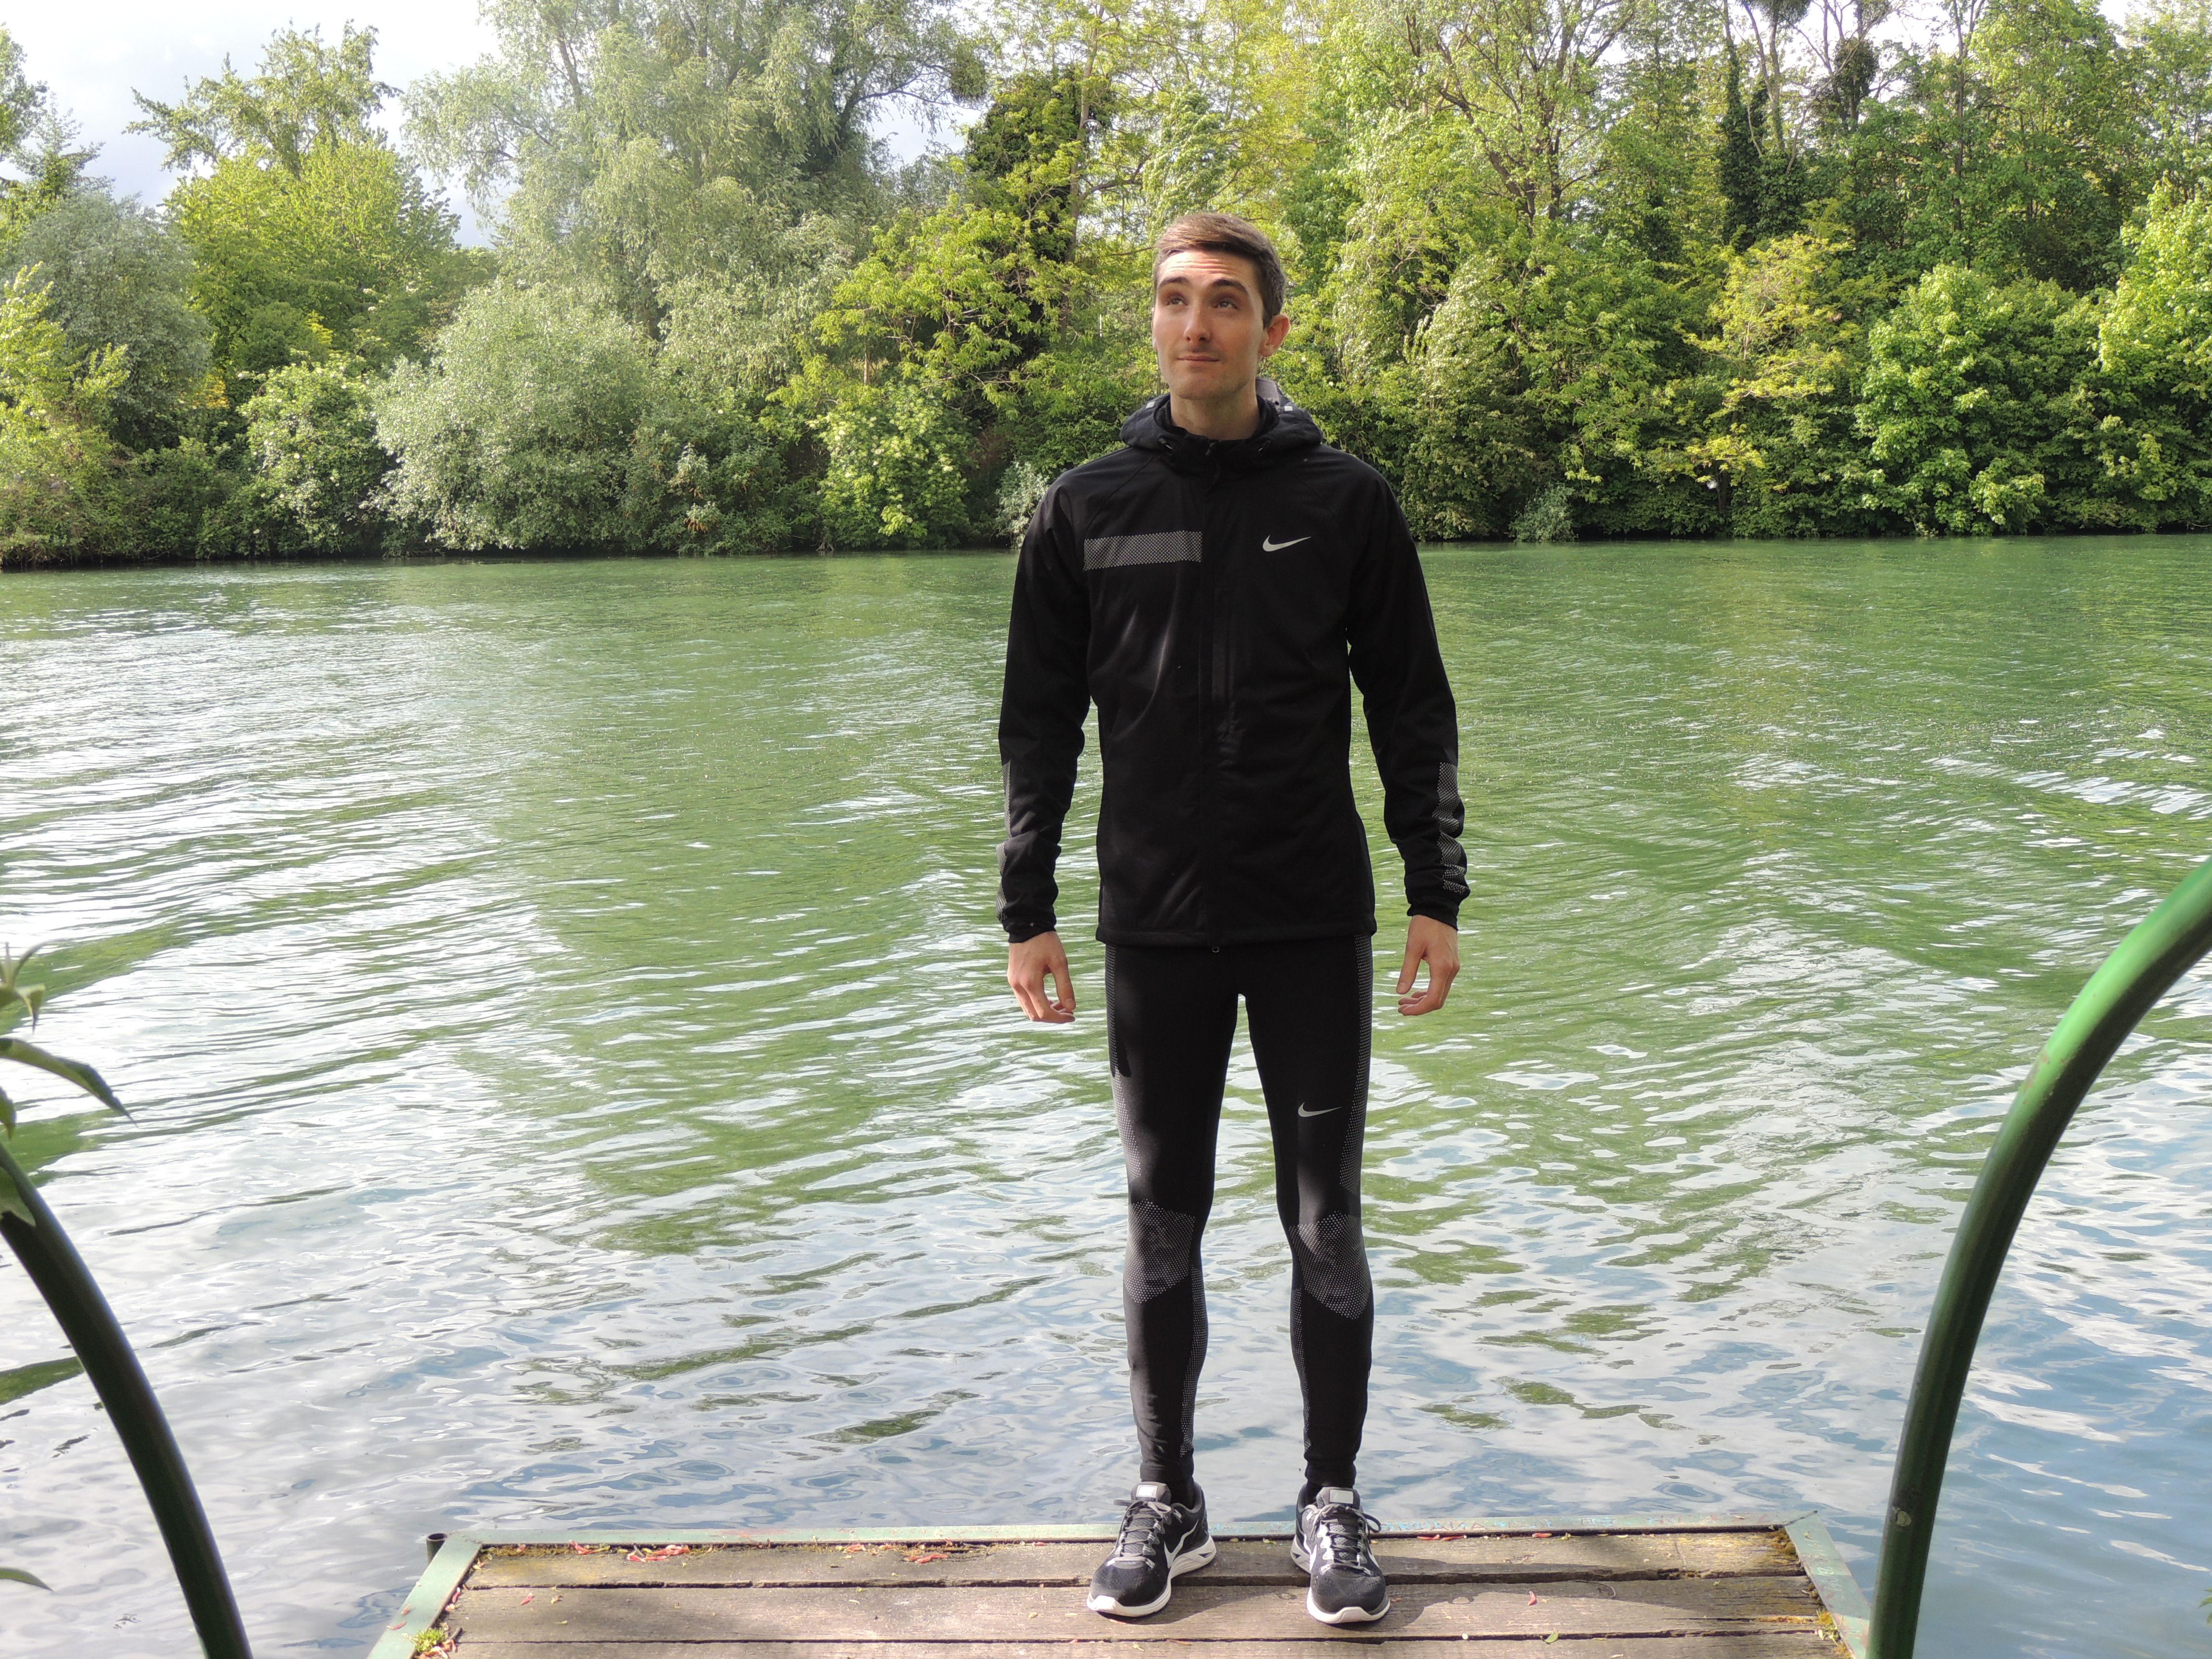 photos officielles 2cadd c81fc vetement homme running hiver